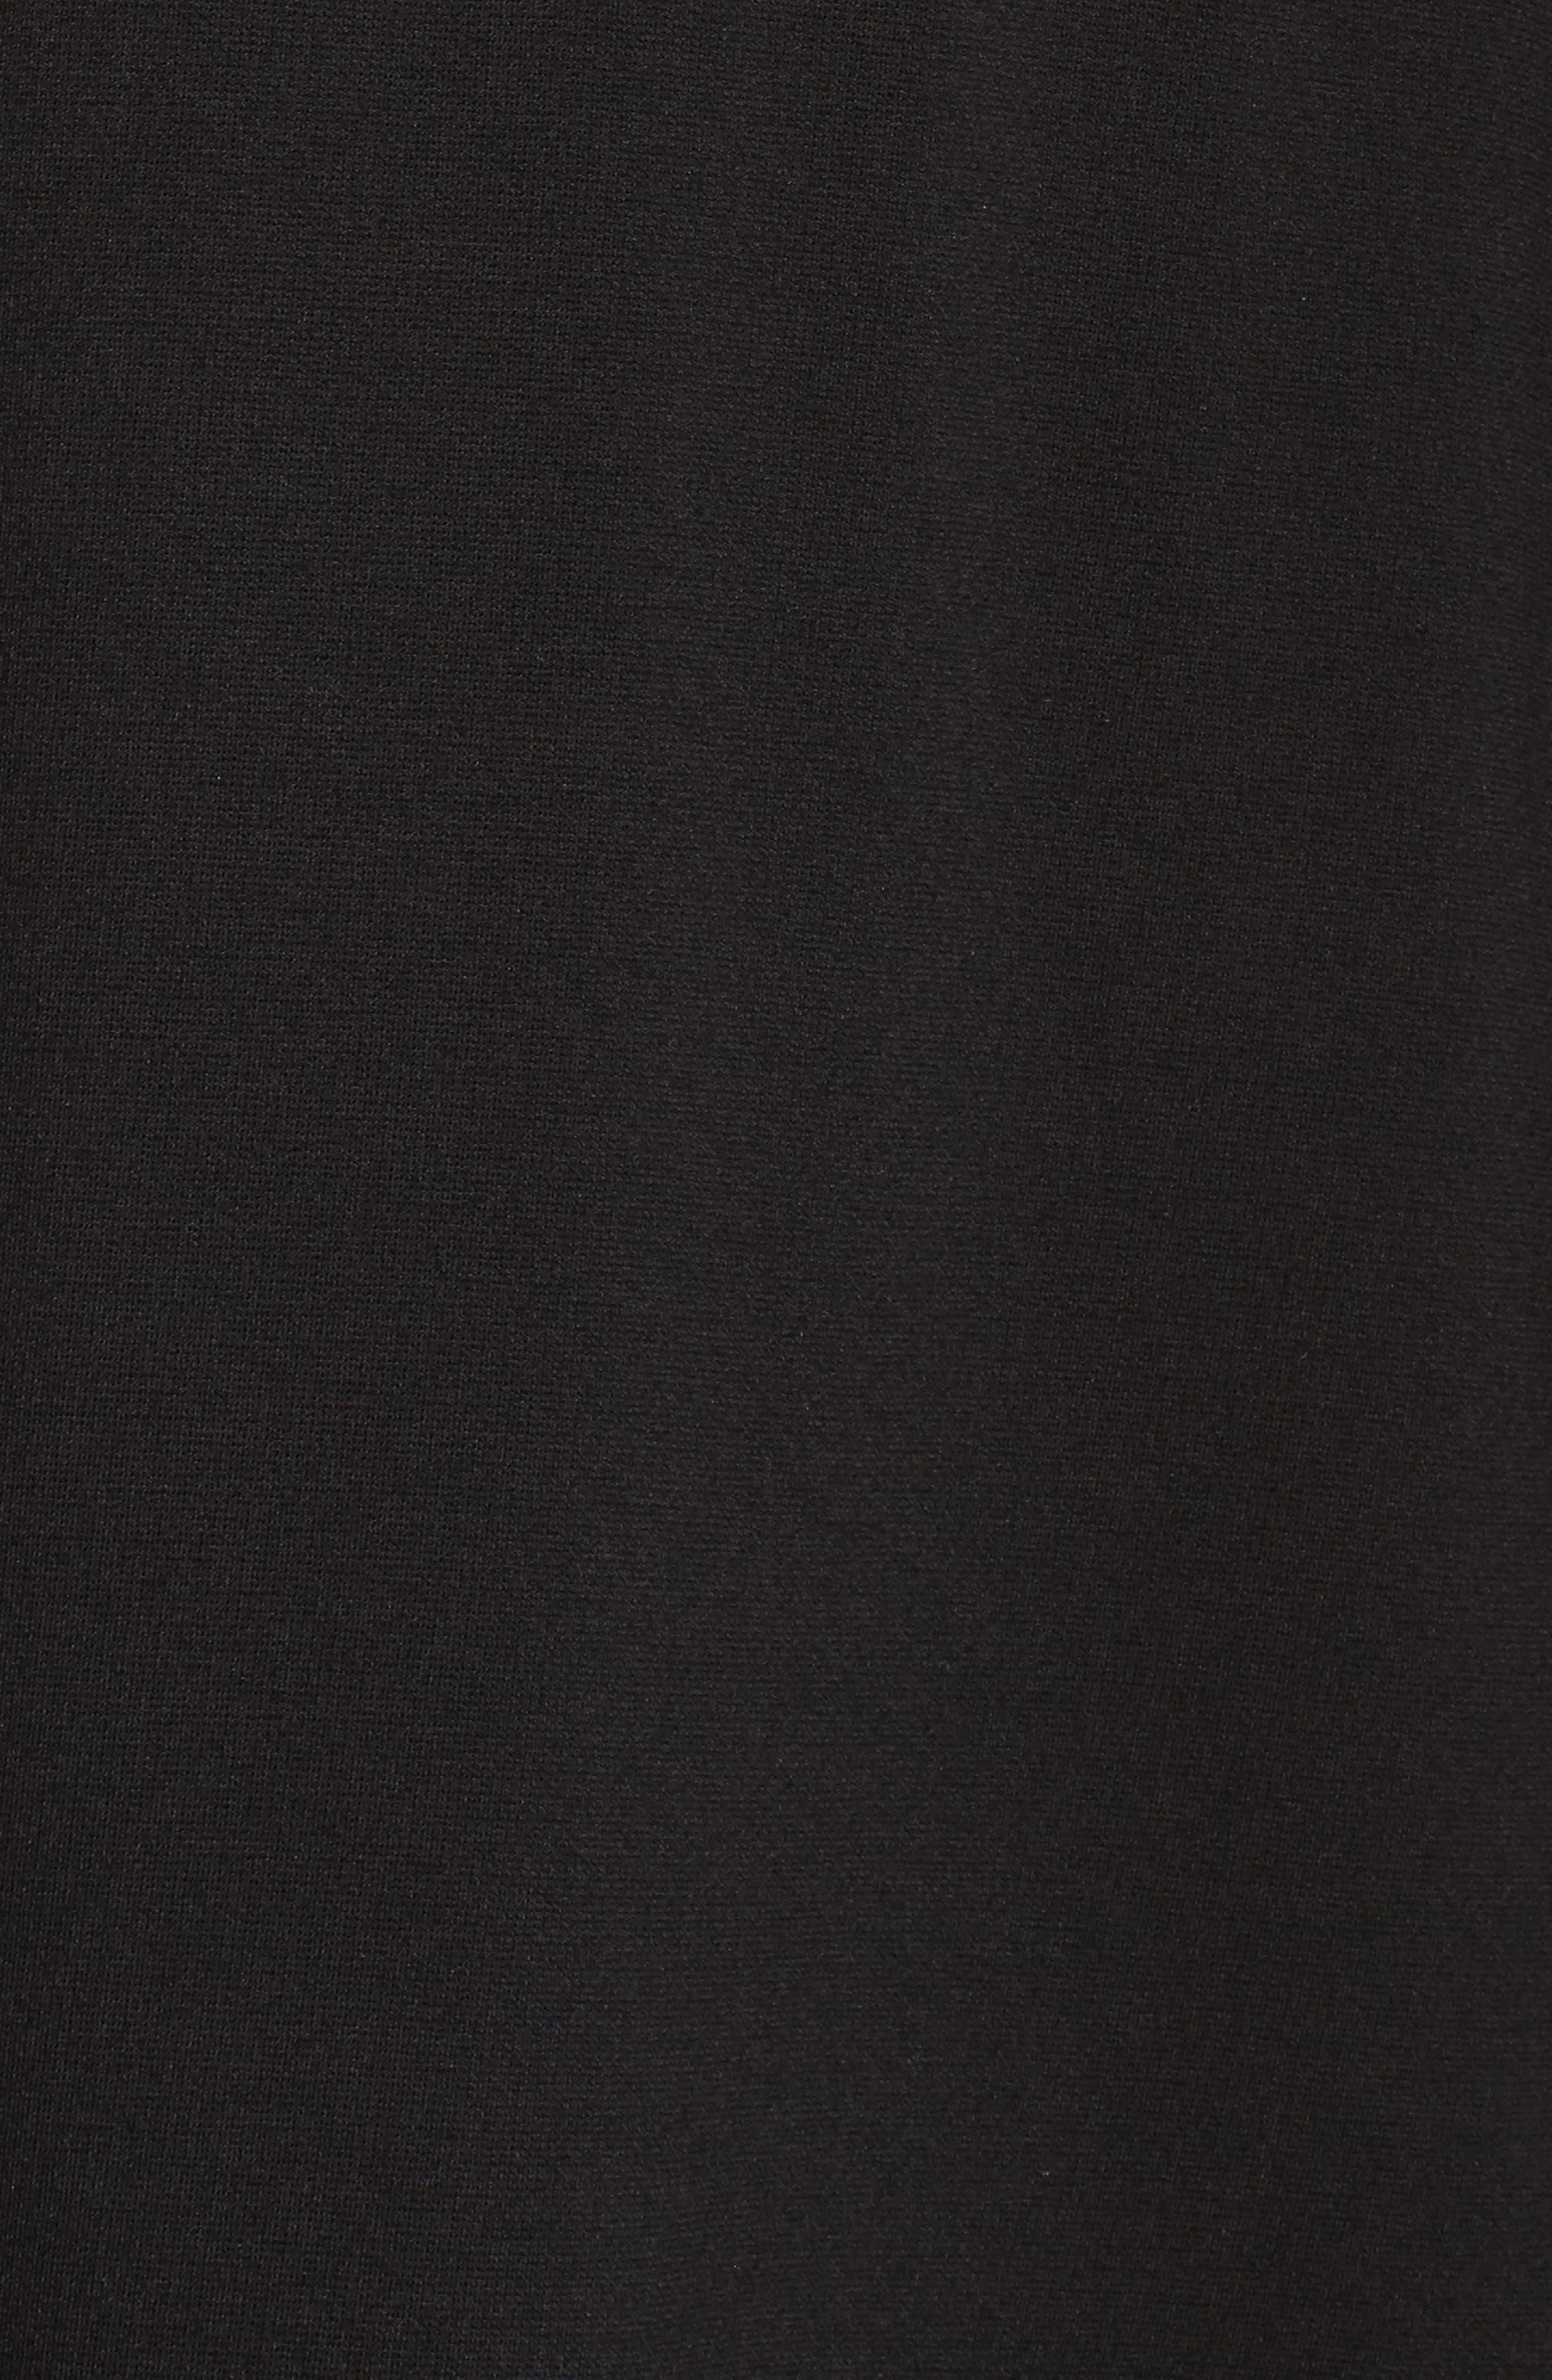 Bell Sleeve Contrast Trim Fit & Flare Dress,                             Alternate thumbnail 5, color,                             BLACK/ IVORY